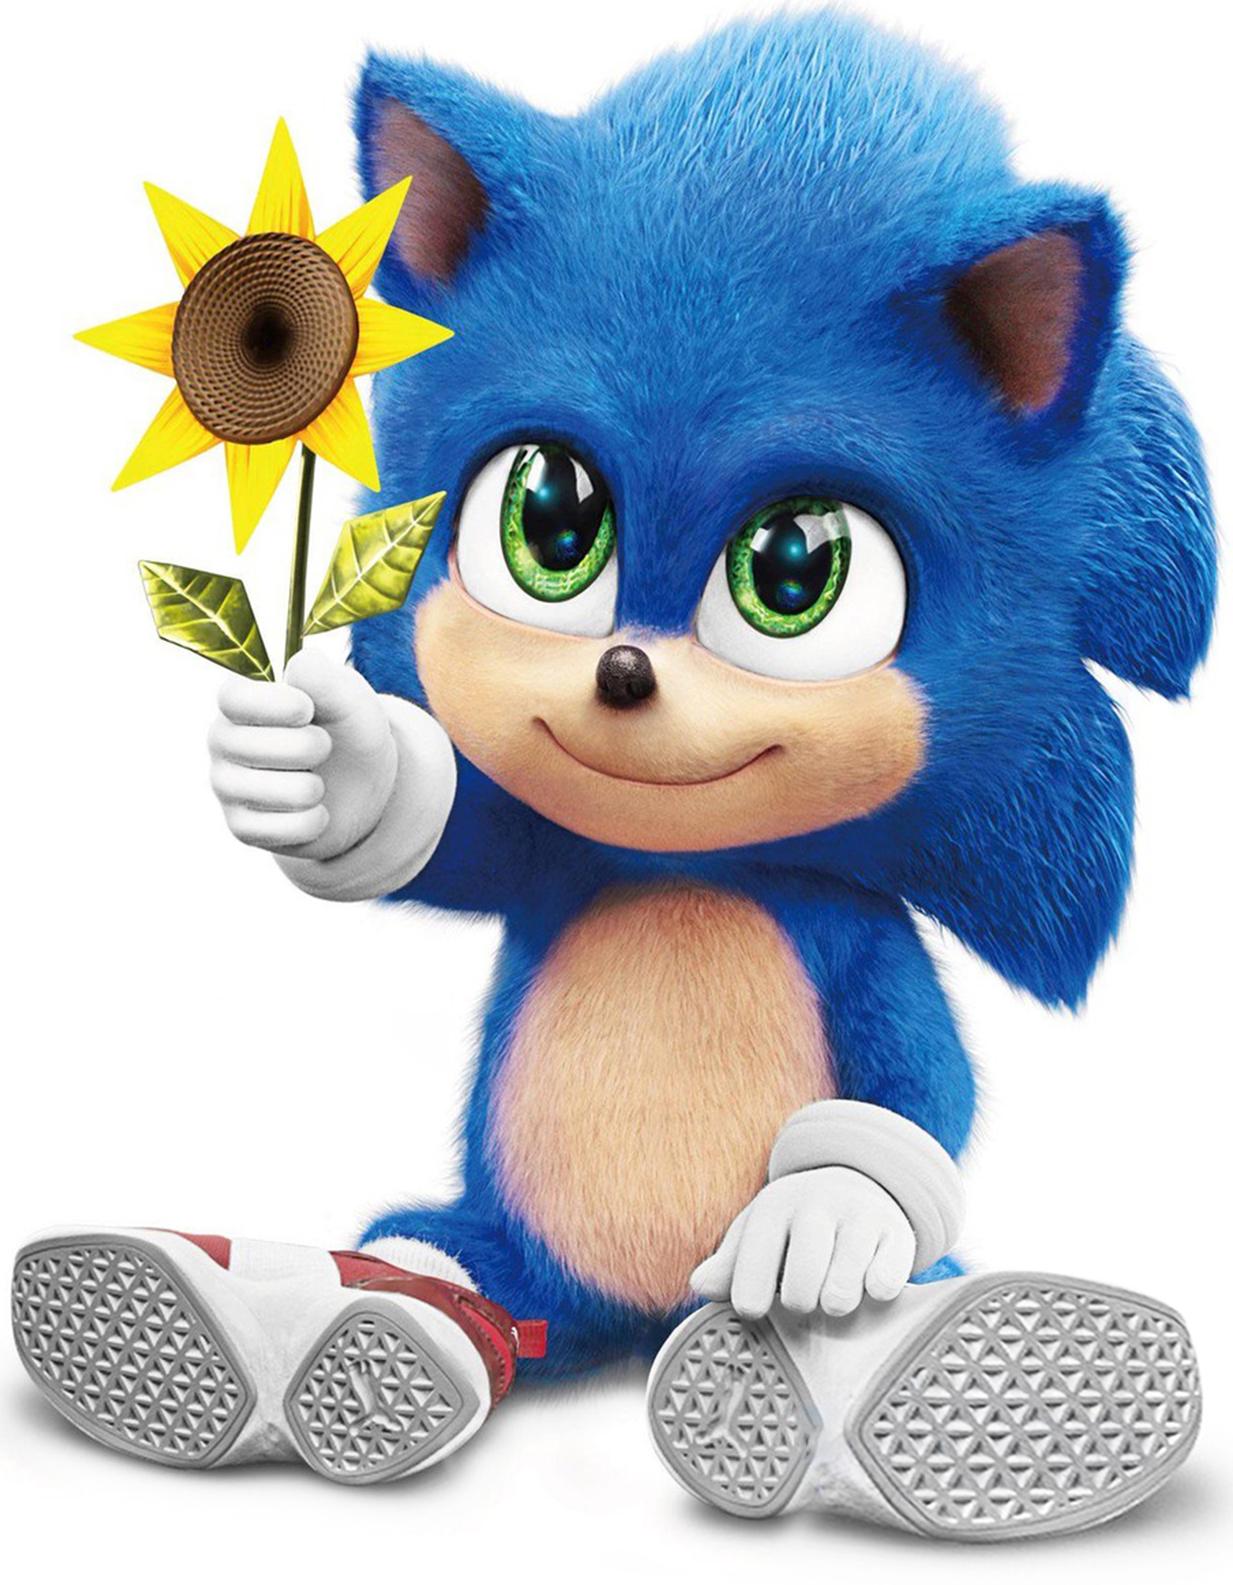 Sonic The Hedgehog Live Action Heroes Wiki Fandom